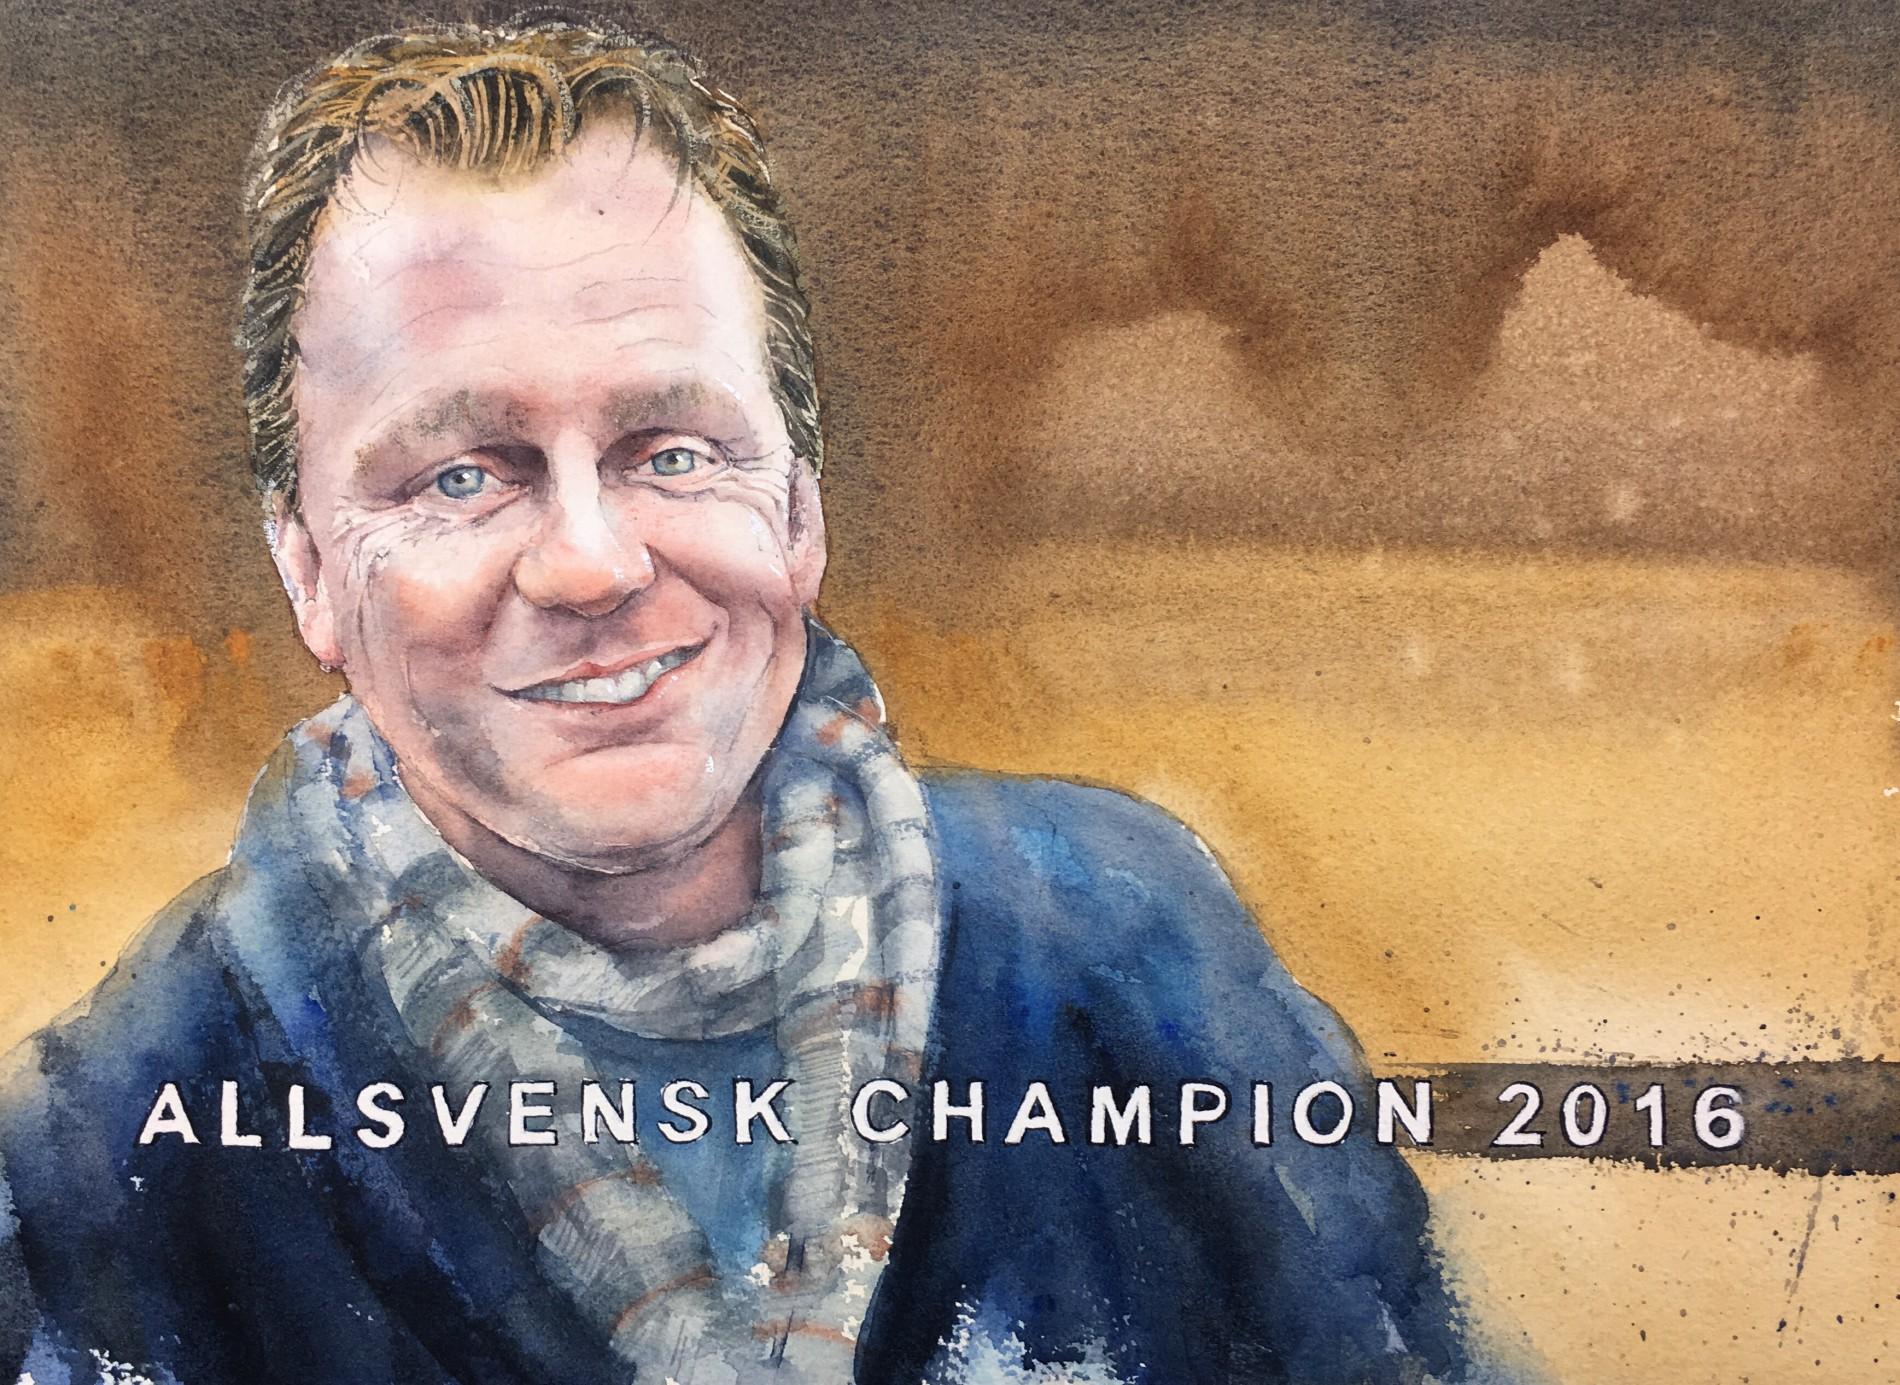 Portrait of Ulf Ohlsson